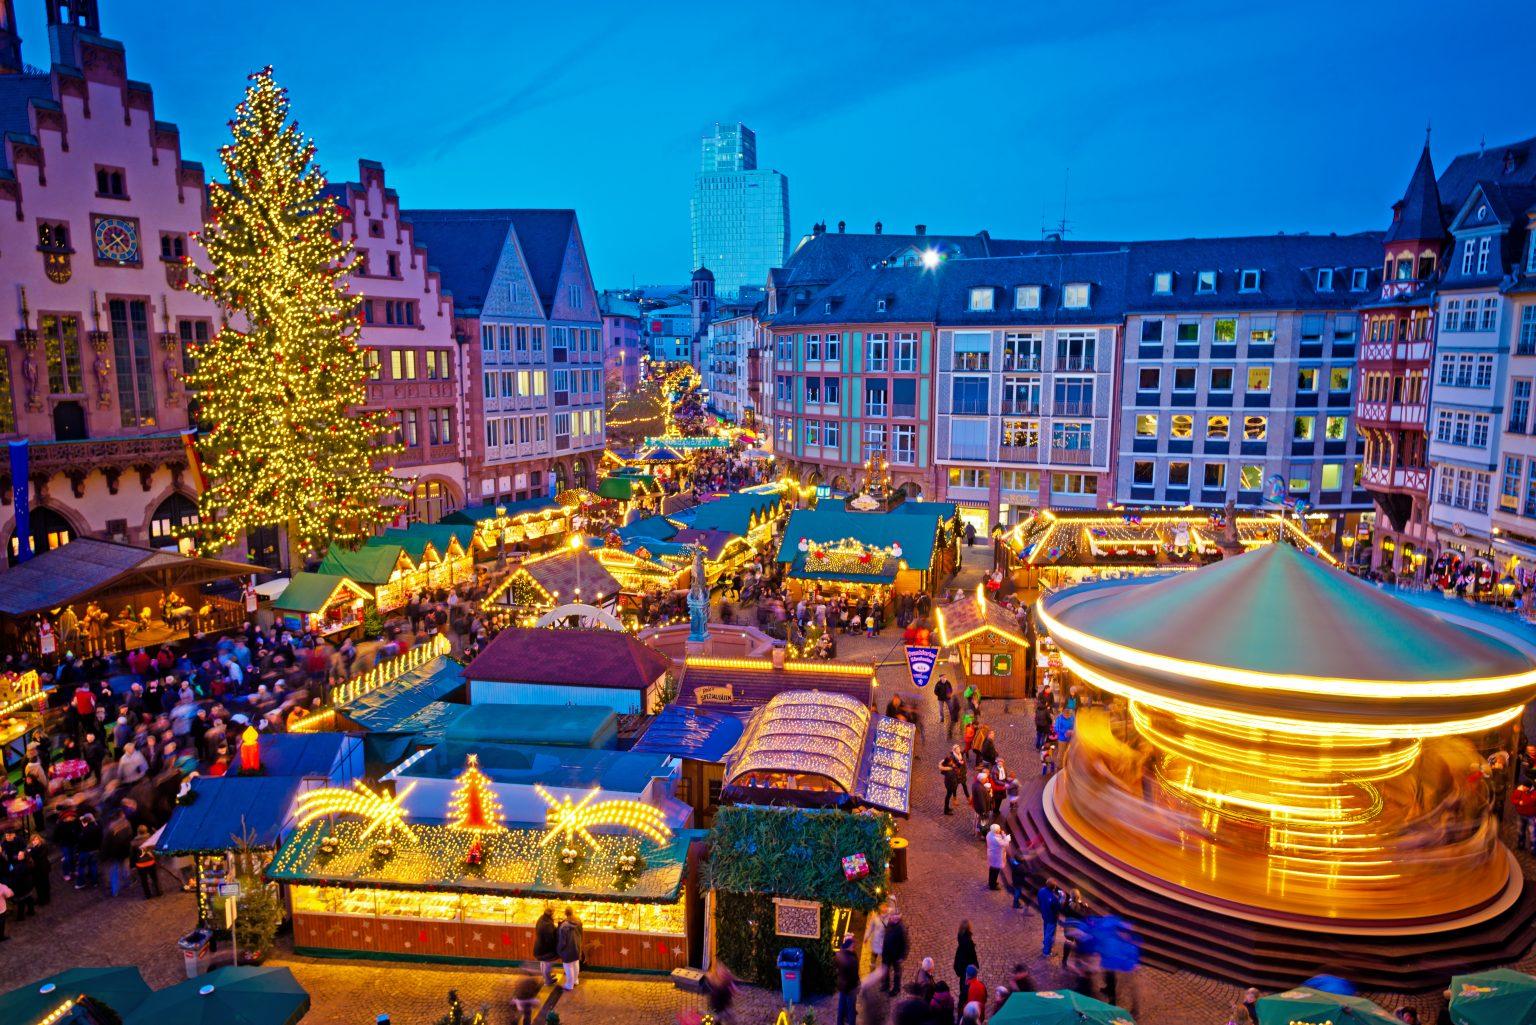 Weihnachtsmarkt Nürnberg 2021 Corona